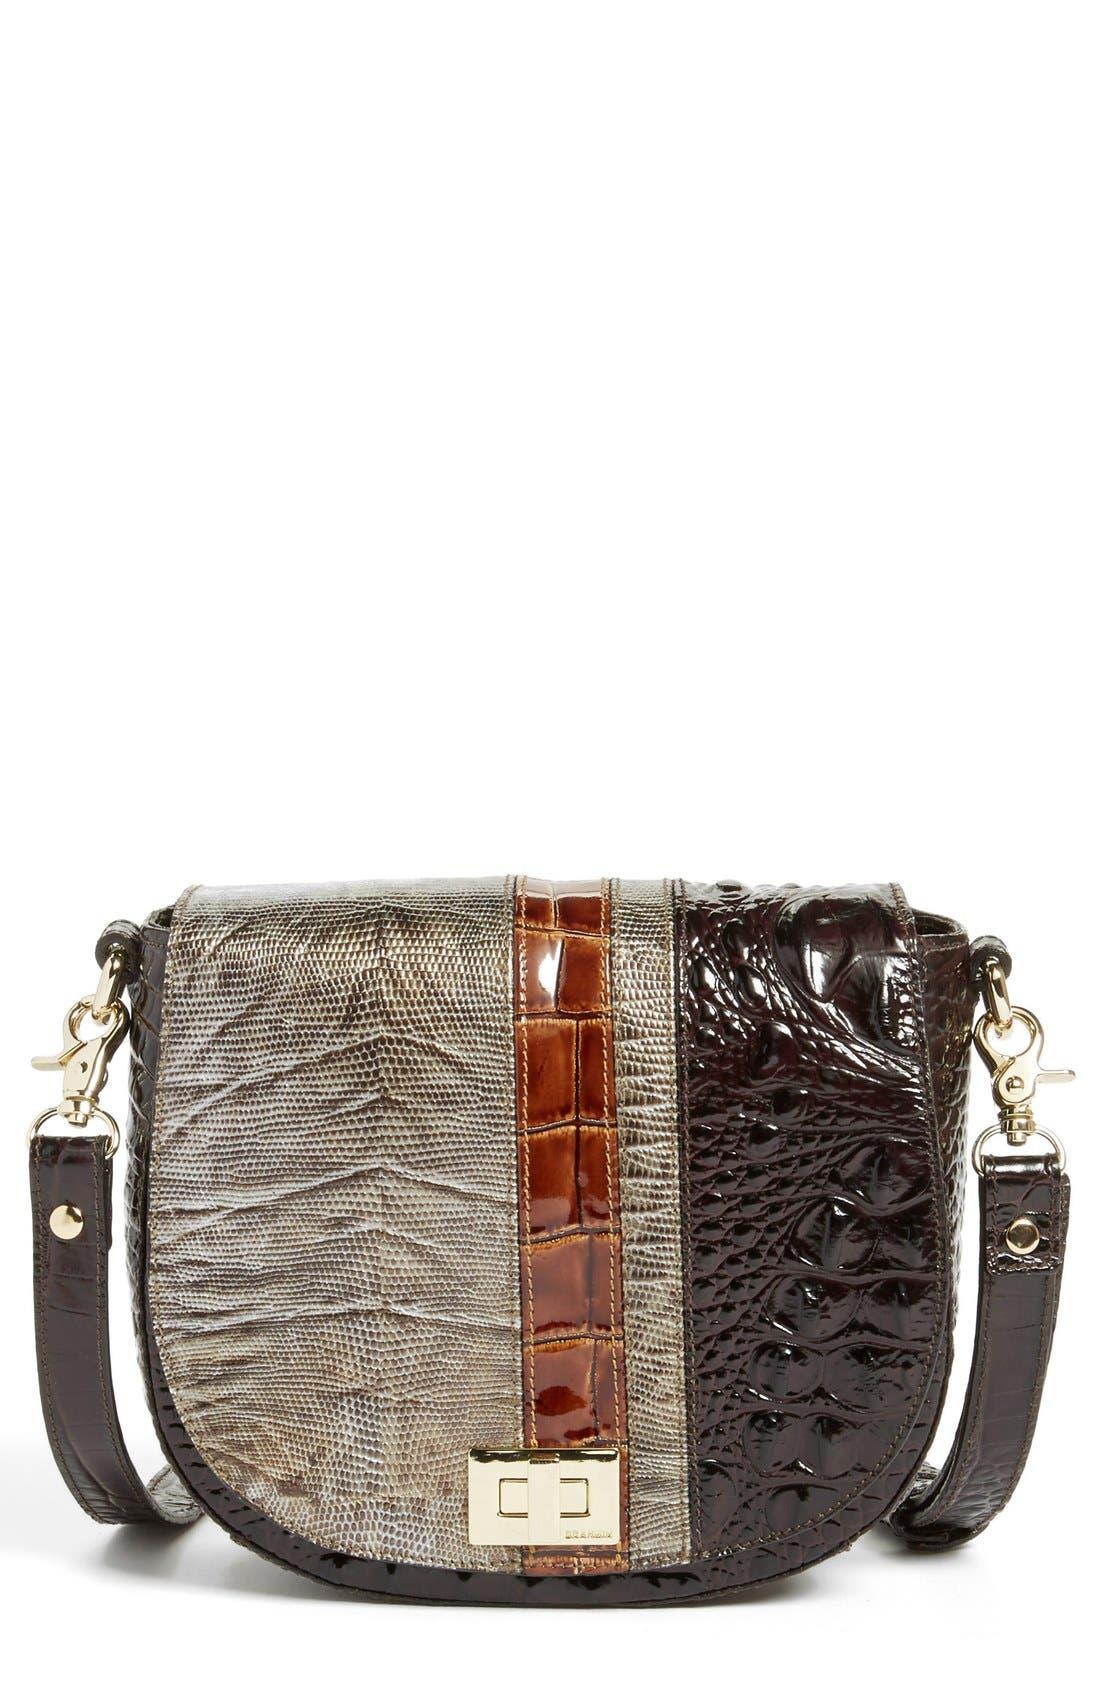 Alternate Image 1 Selected - Brahmin 'Tillie' Embossed Leather Crossbody Bag (Nordstrom Exclusive)